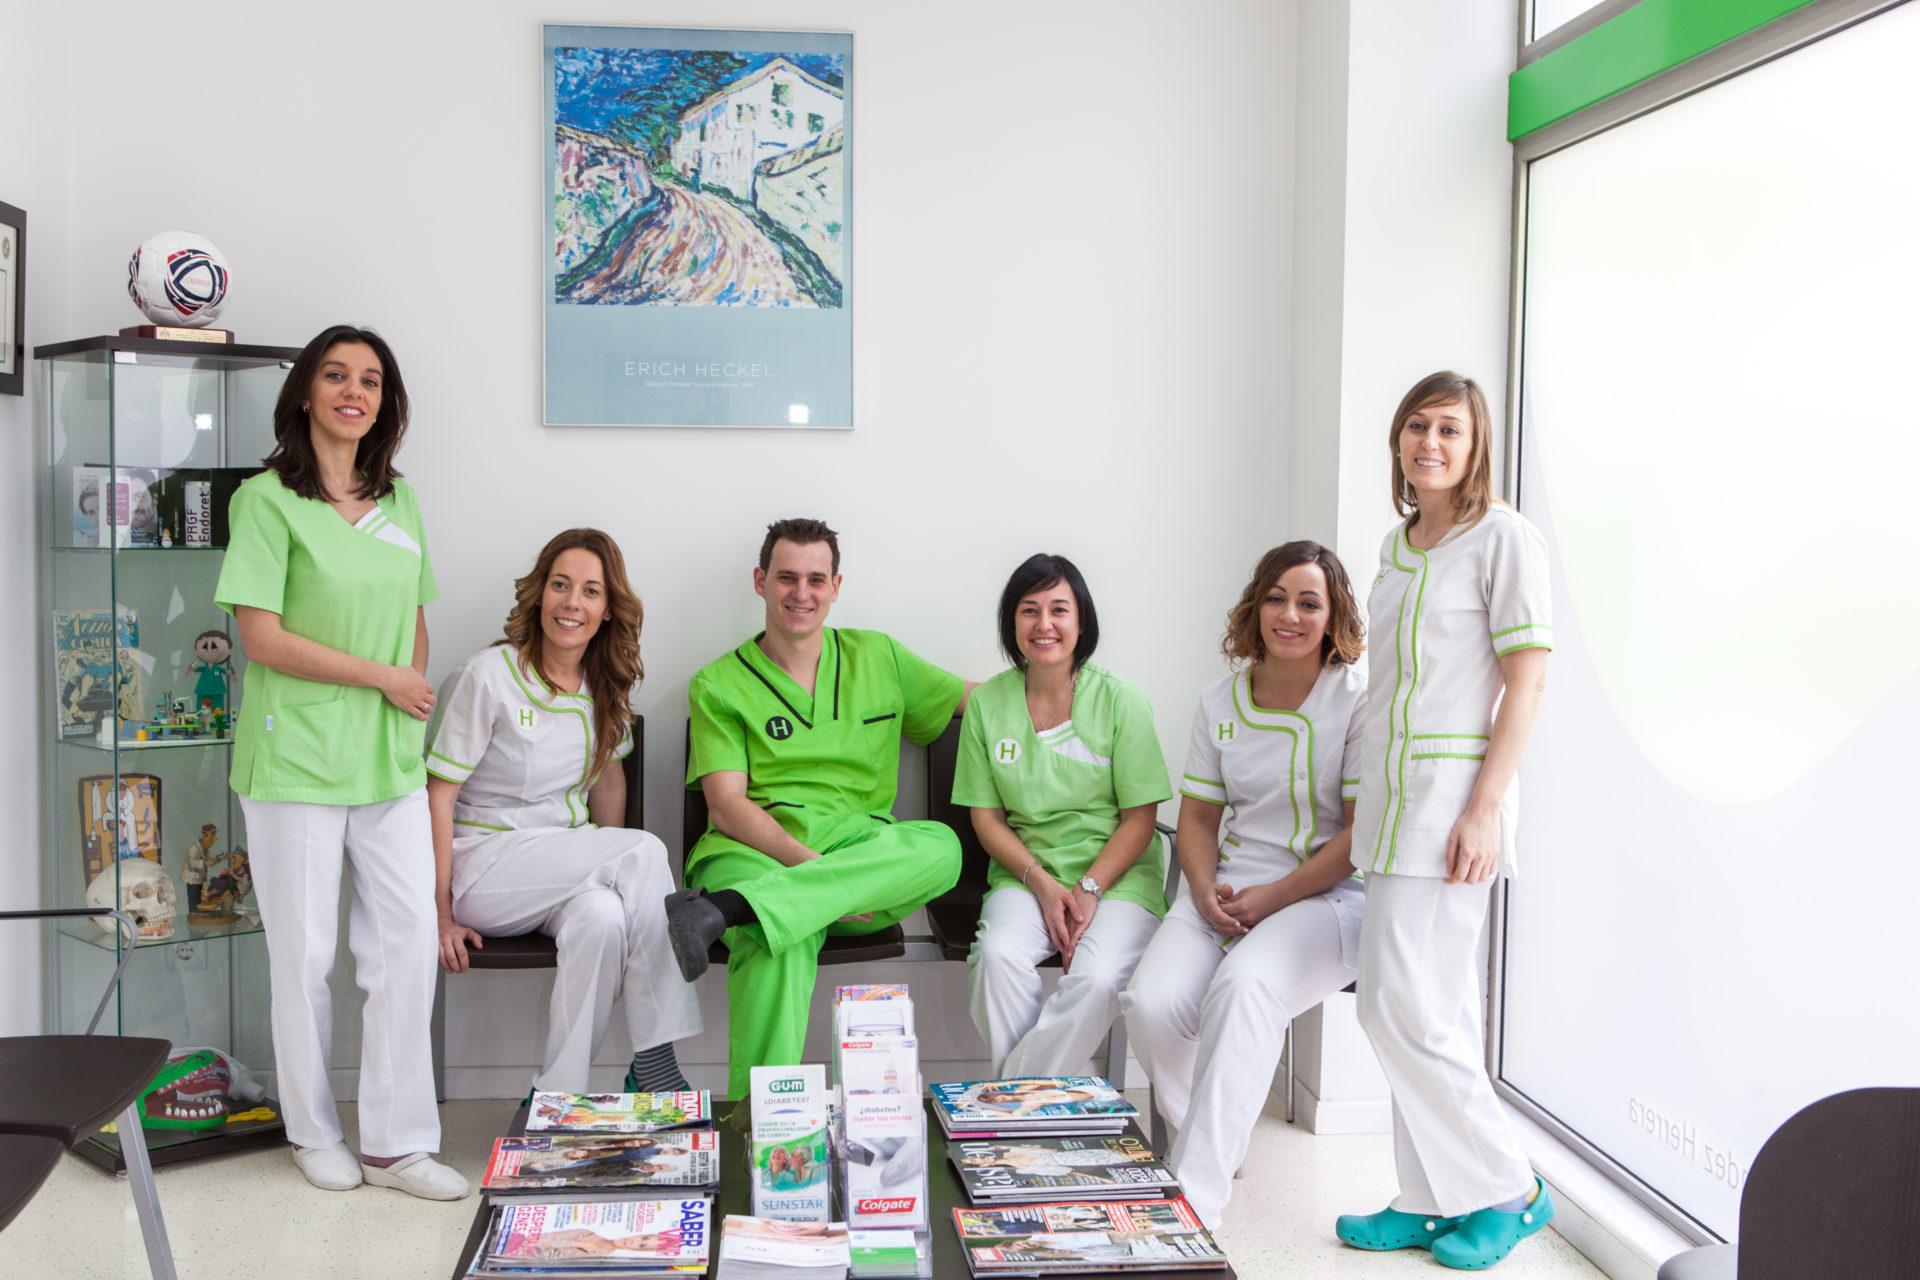 Equipo Clínica Dental Hernández Herrera Gijón